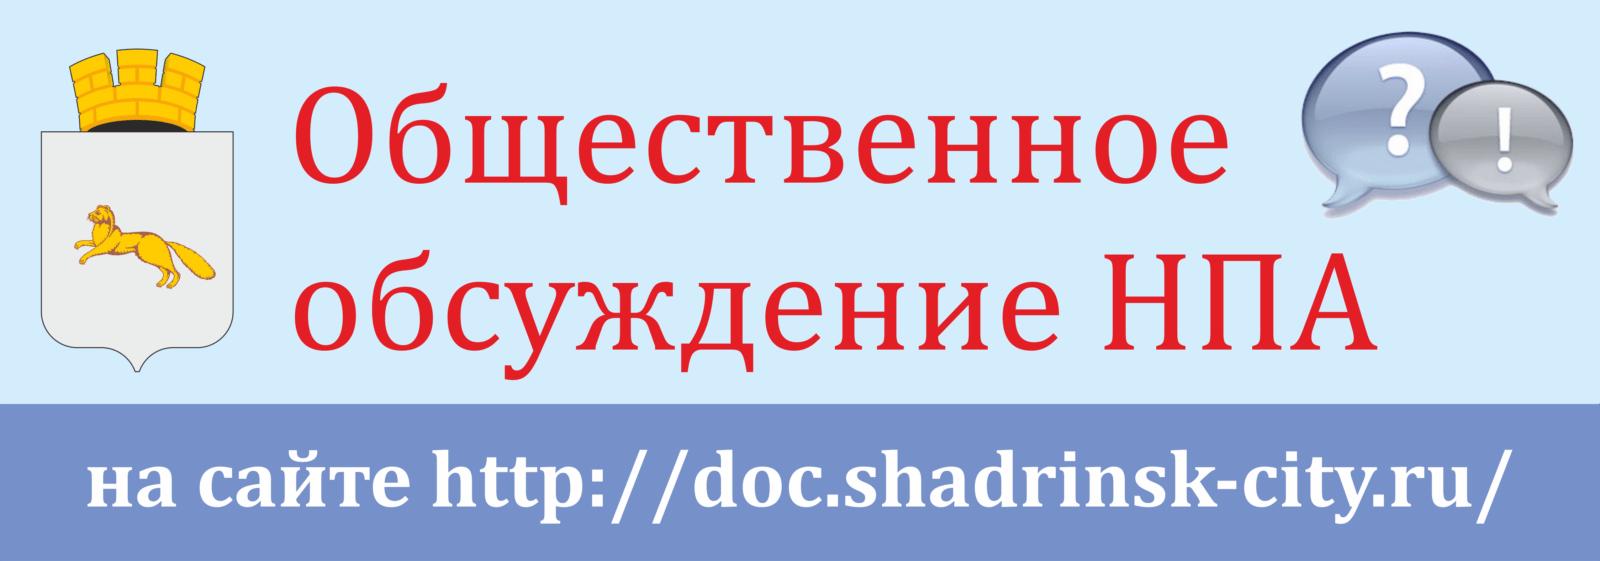 45 ру работа шадринск